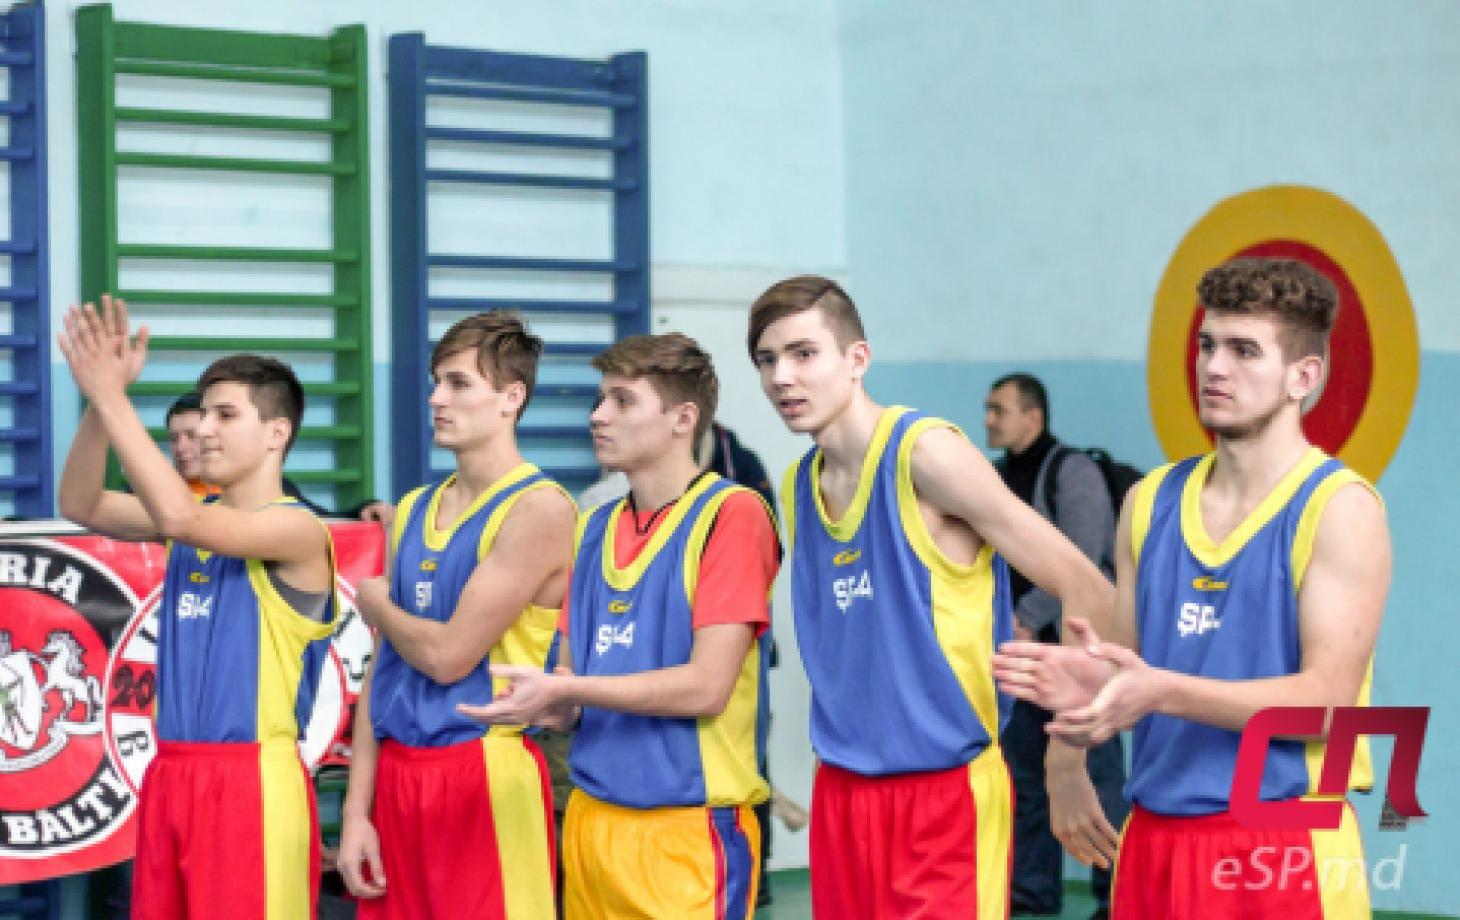 Турнир по баскетболу «Жизнь без наркотиков» в Бельцах